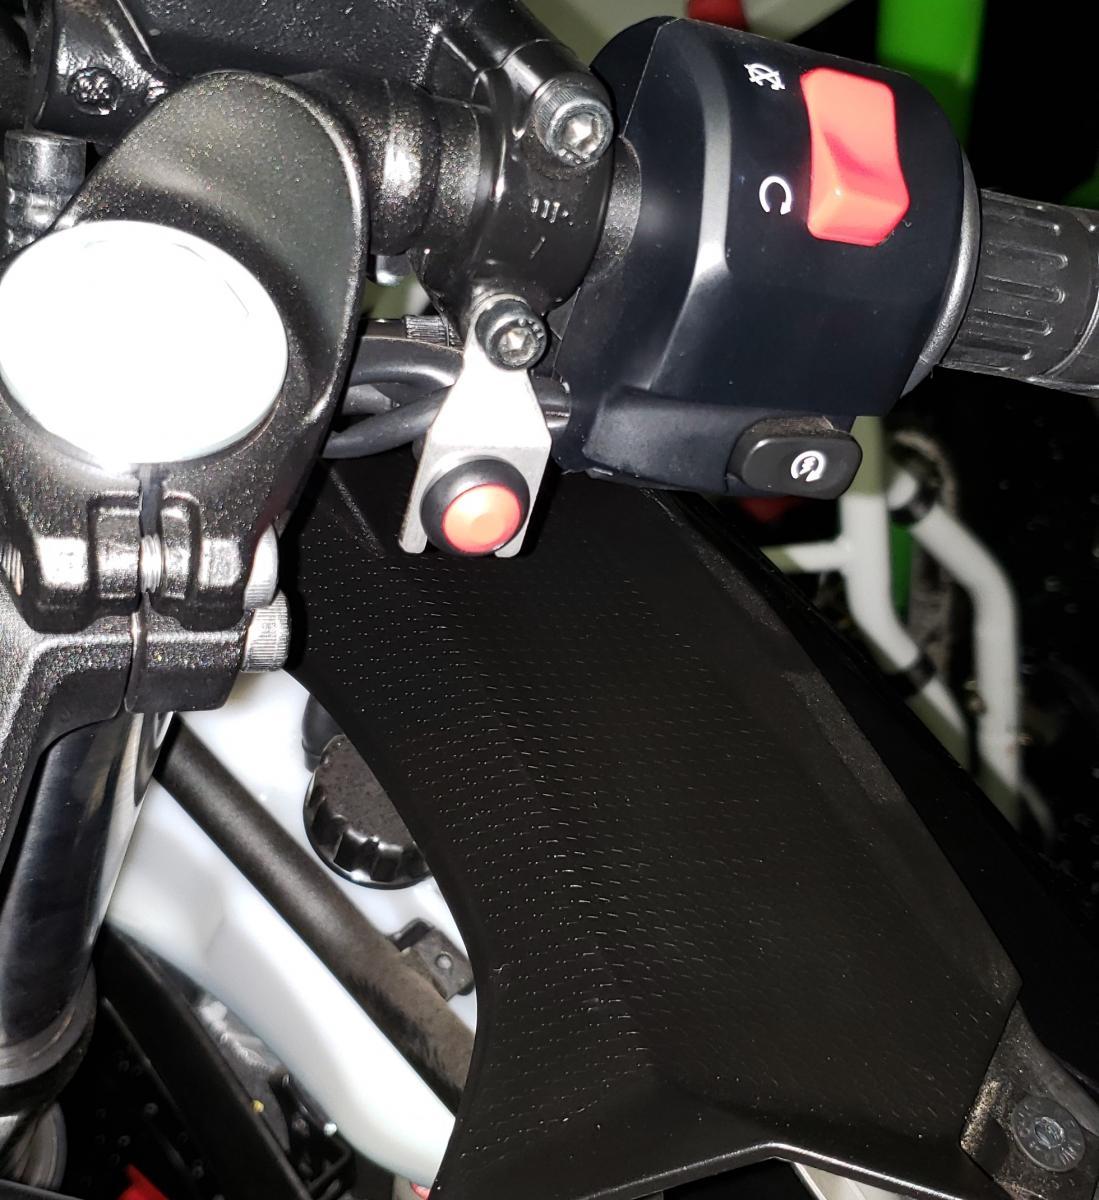 ECU flash using Woolich Racing software - Page 3 - Kawasaki